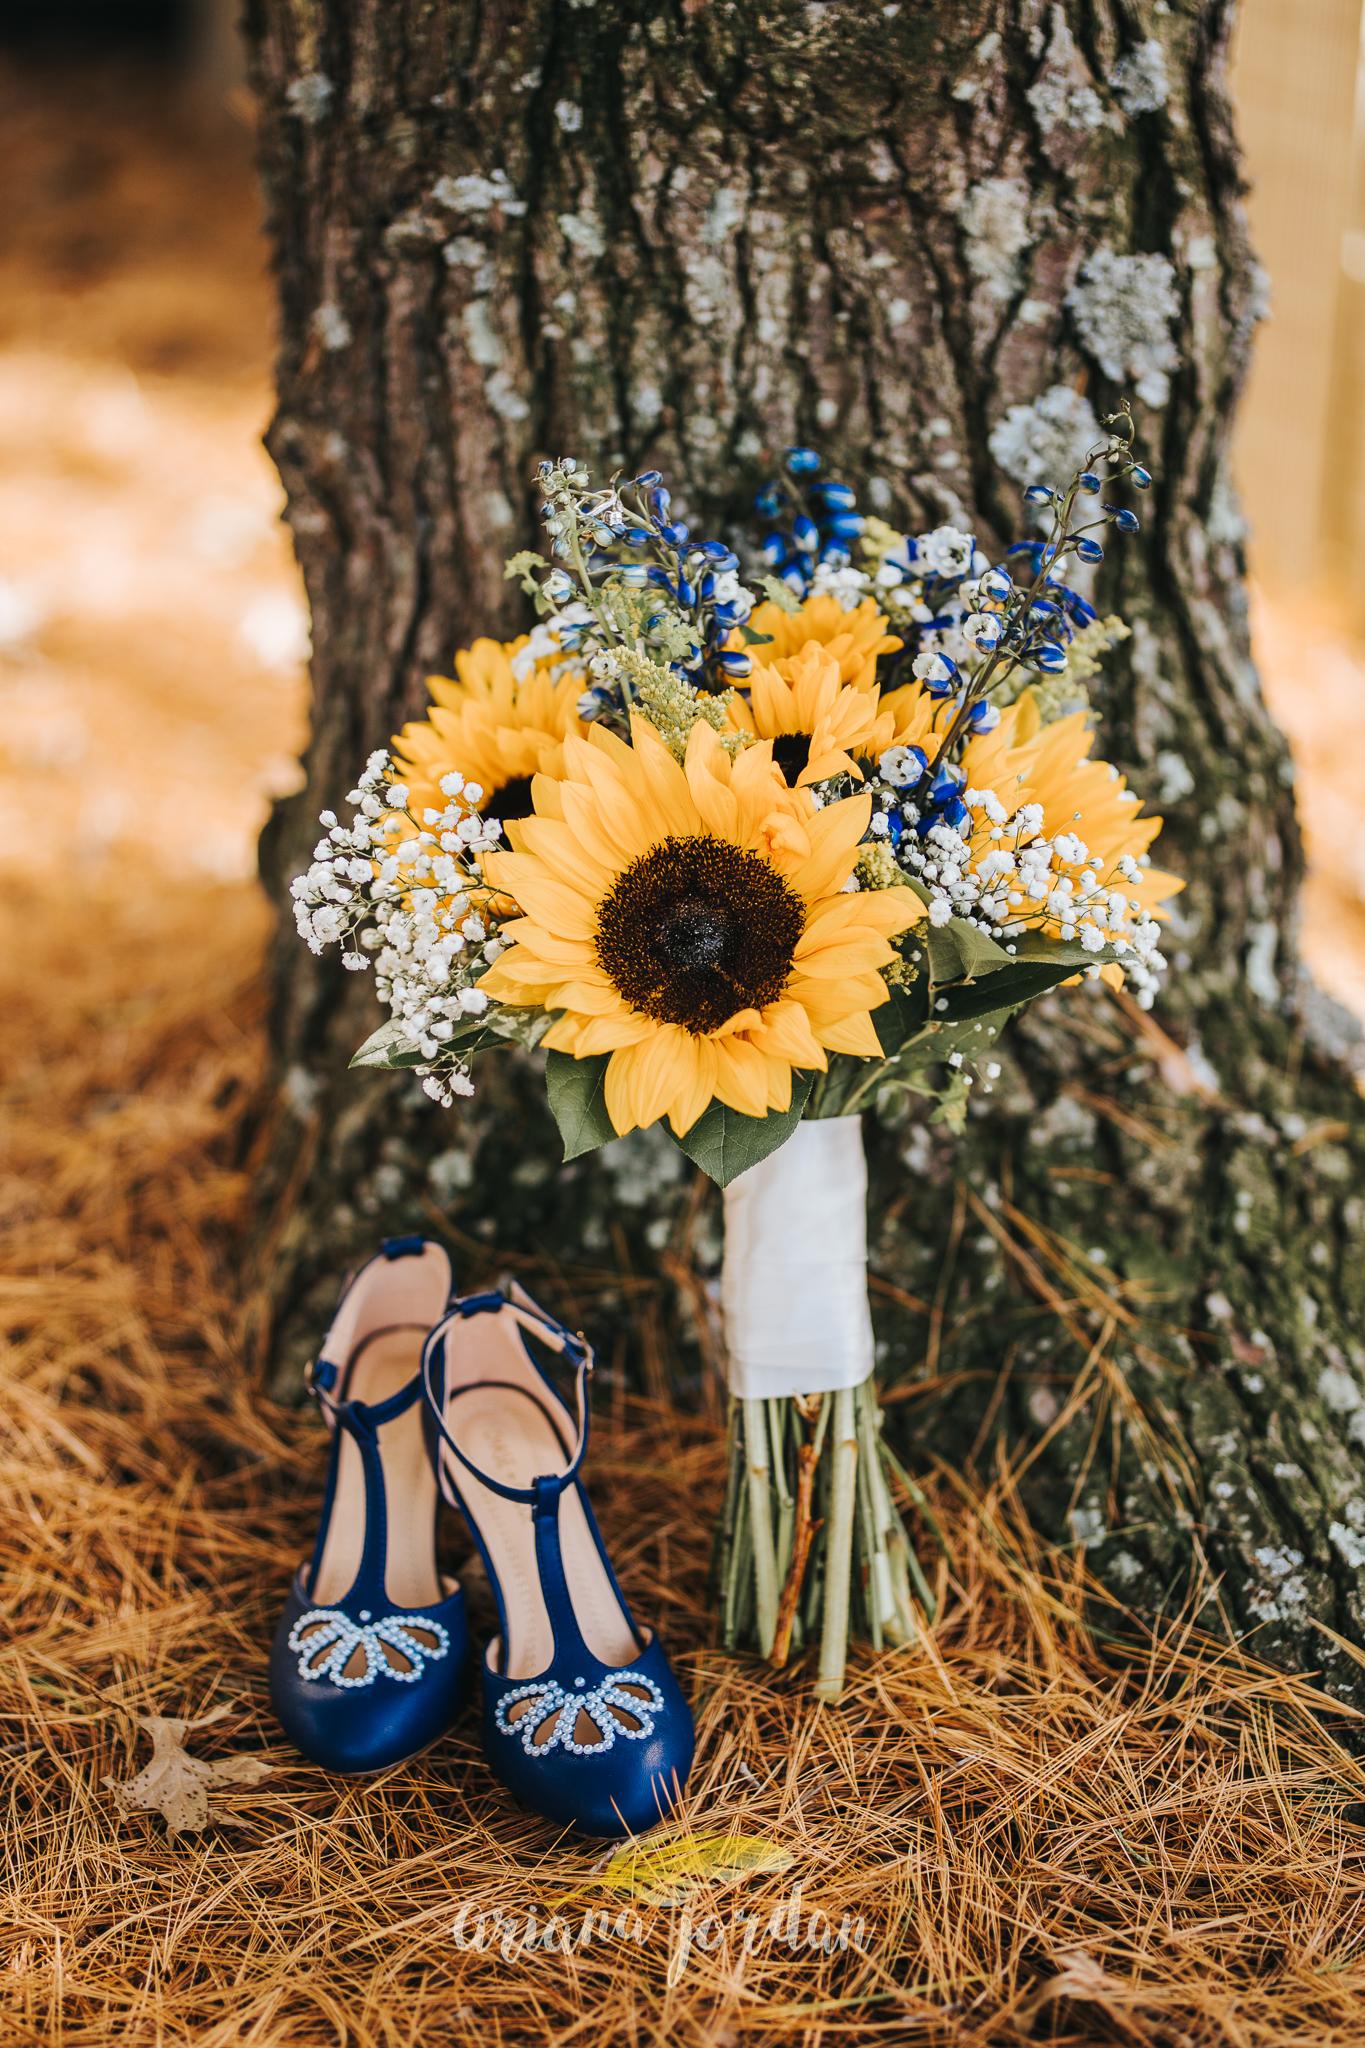 017 Ariana Jordan Photography -Moonlight Fields Lexington Ky Wedding Photographer 4110.jpg